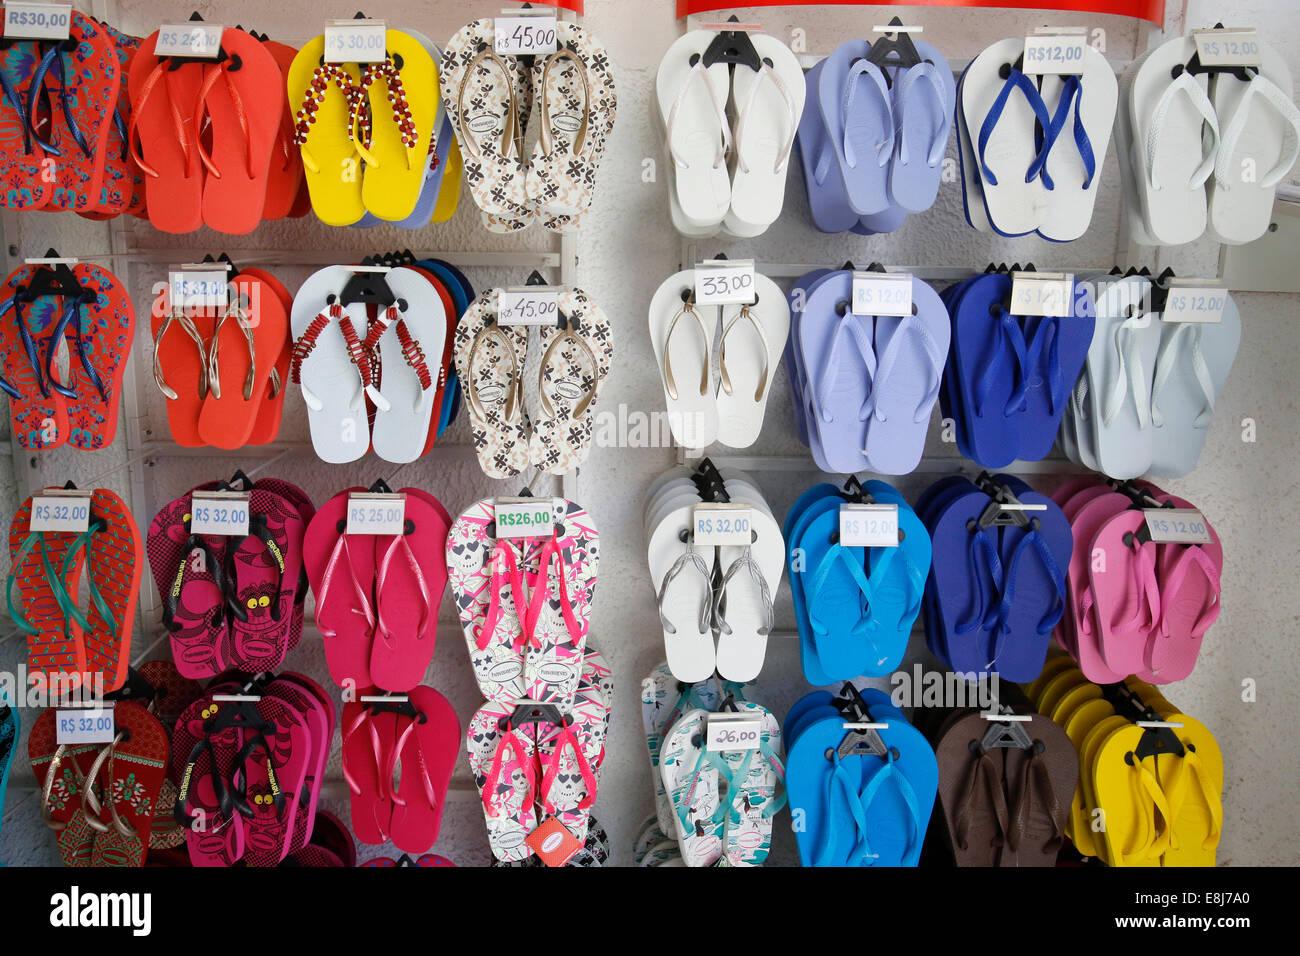 9a8ae33445b1 Brazil Flip Flop Shop Stock Photos   Brazil Flip Flop Shop Stock ...